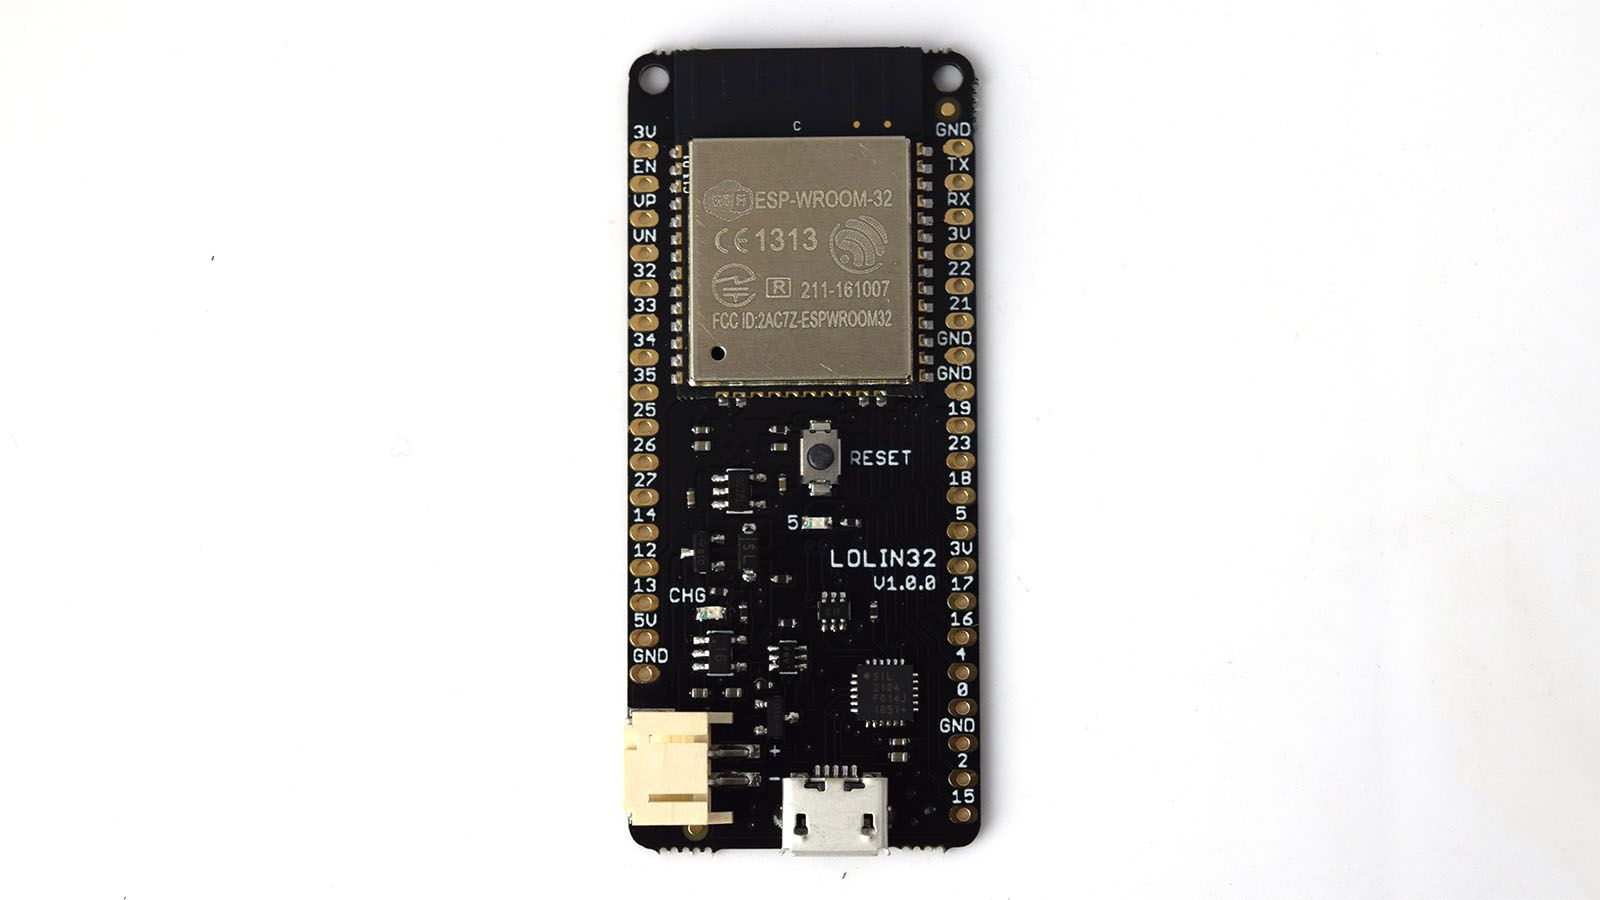 LOLIN32 A wifi&bluetooth board based on ESP-32 | Nerd's toys